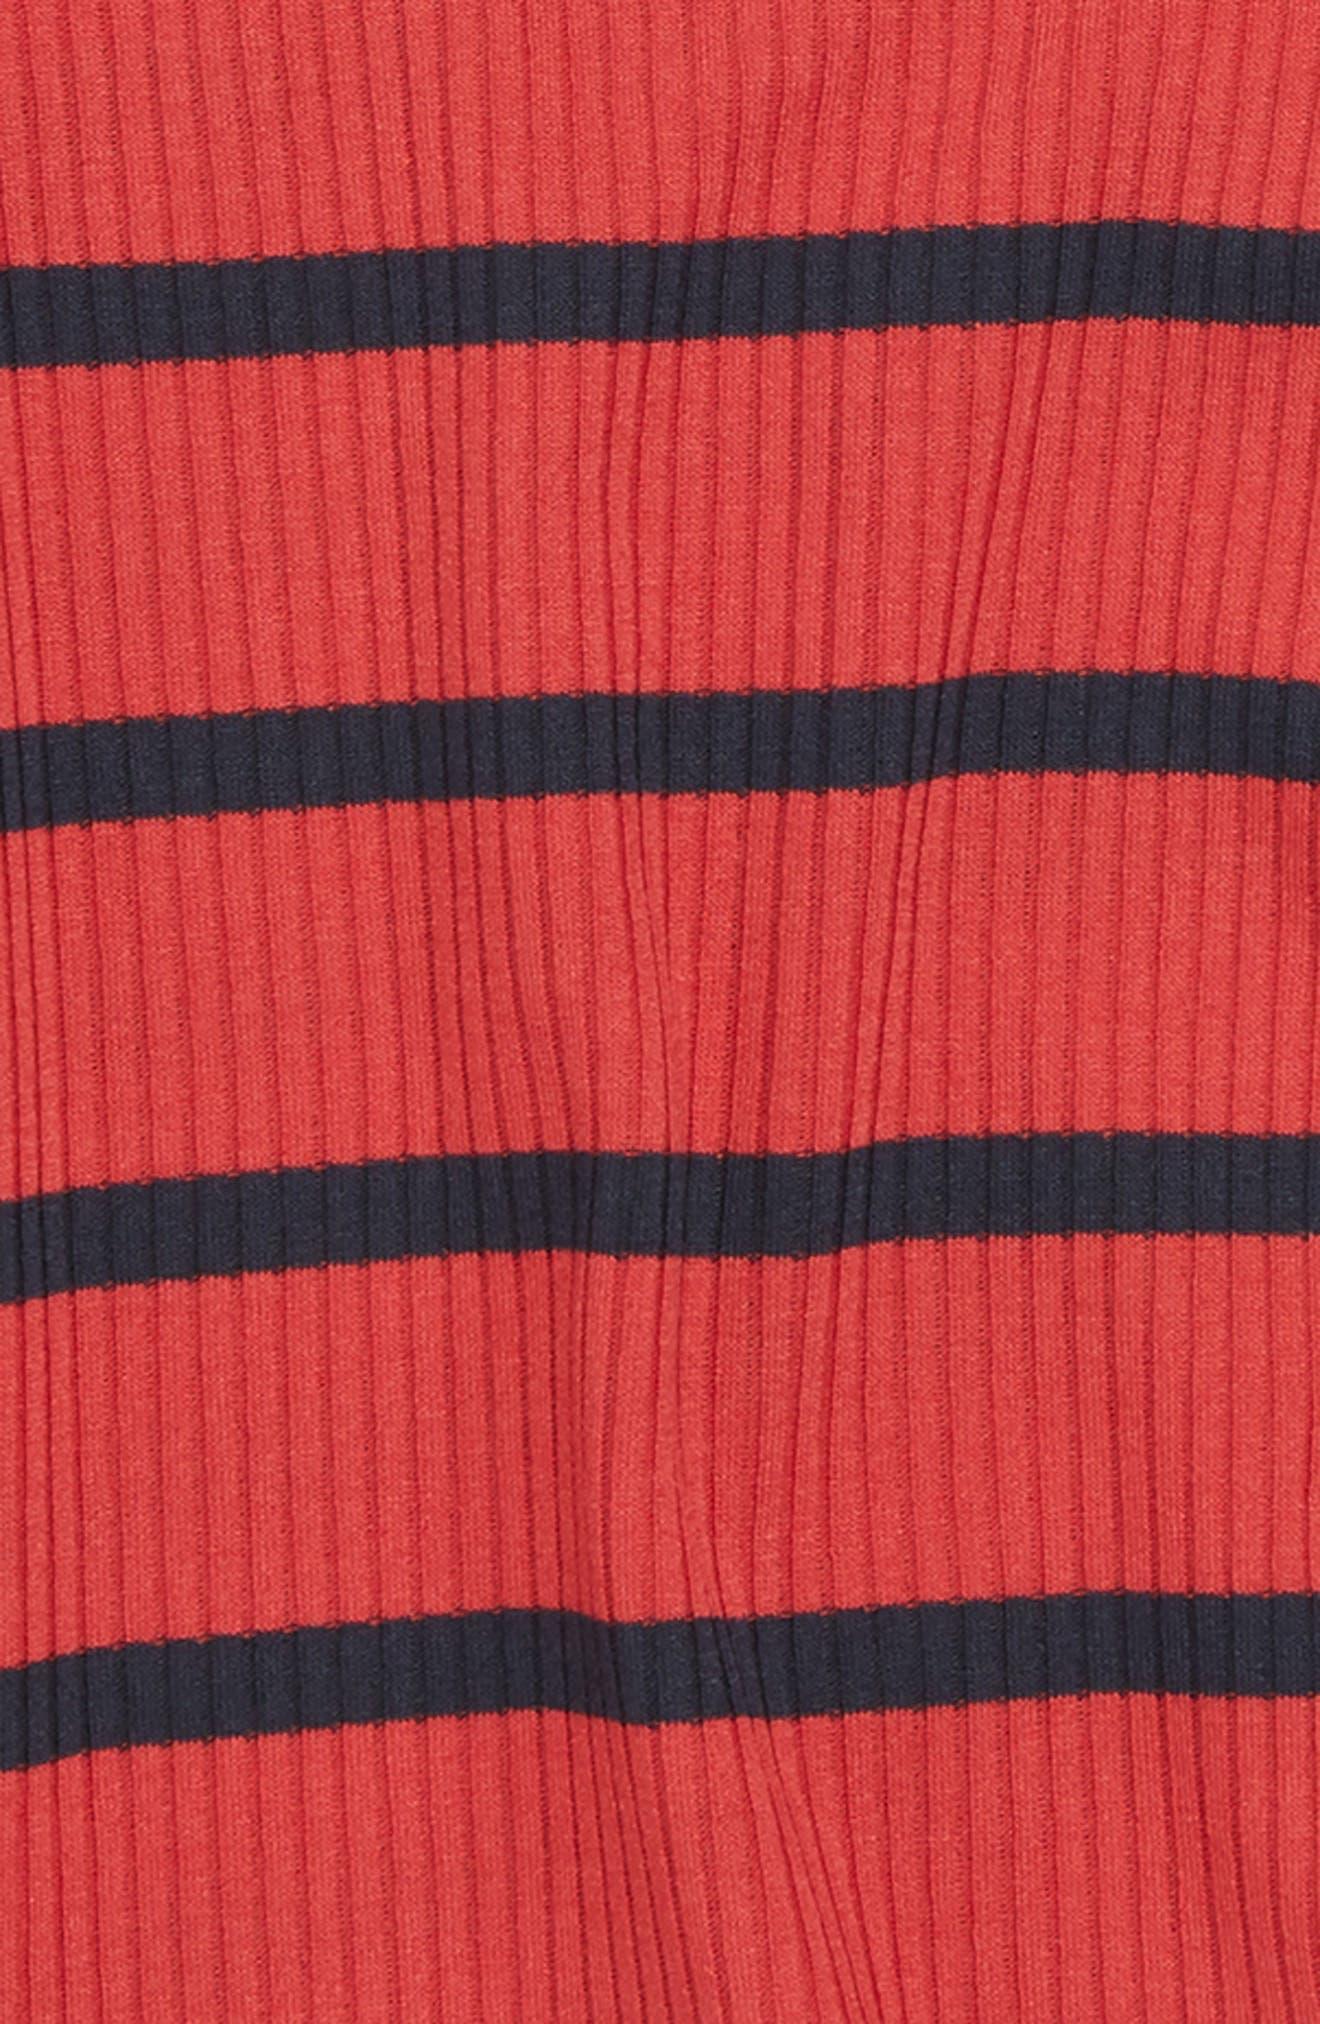 Stripe Cold Shoulder Top,                             Alternate thumbnail 2, color,                             Red/ Navy